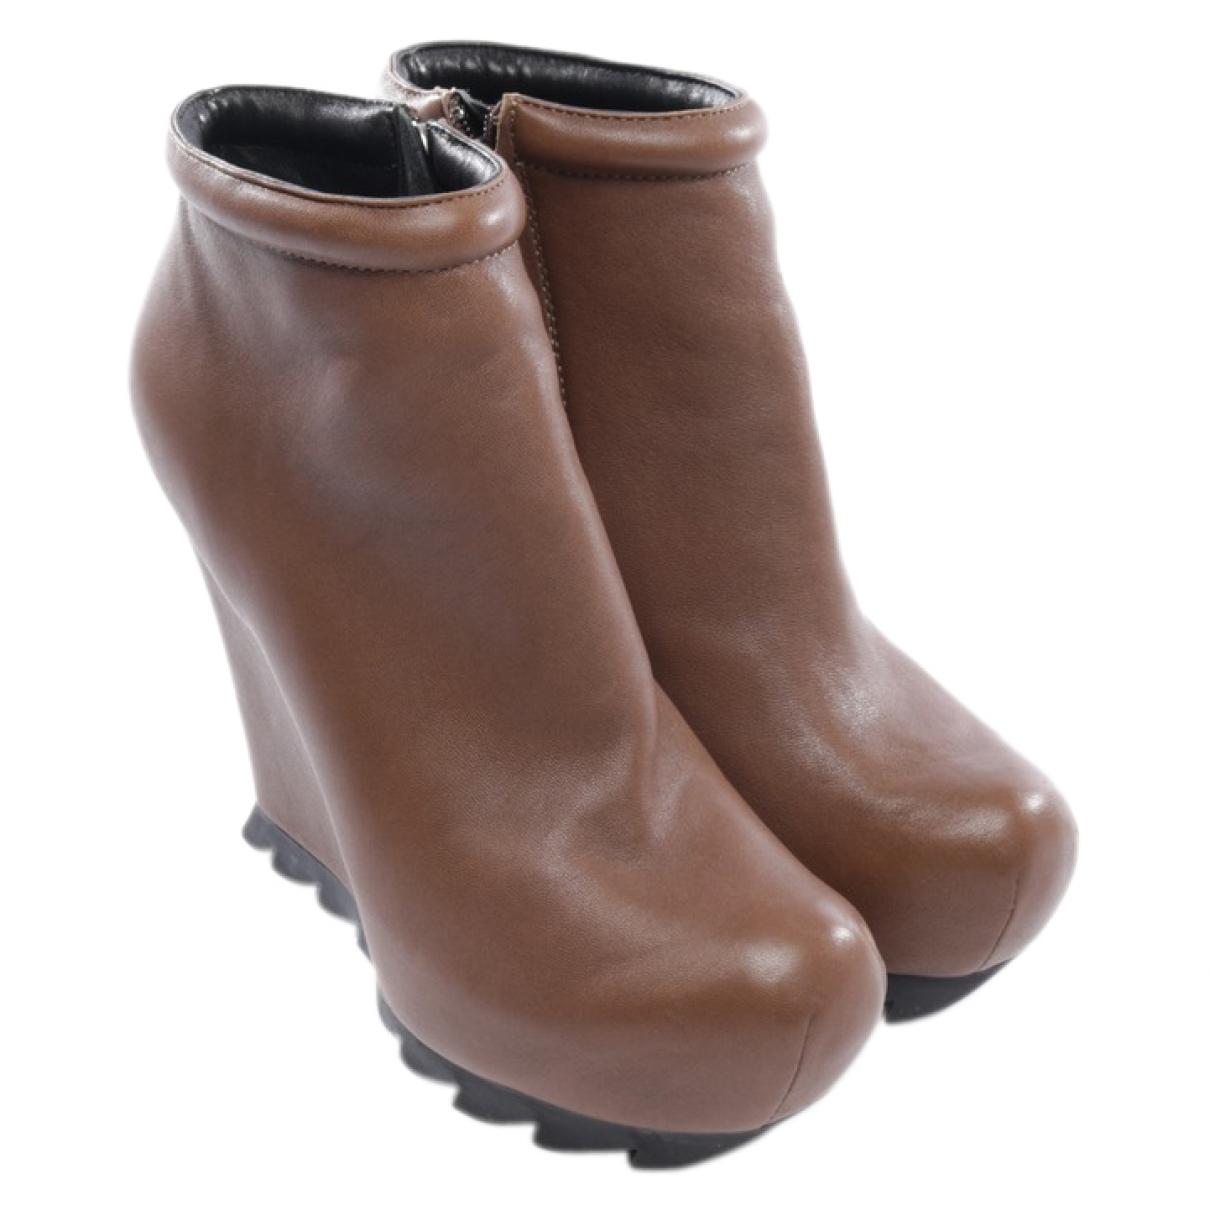 Camilla Skovgaard - Boots   pour femme en toile - marron